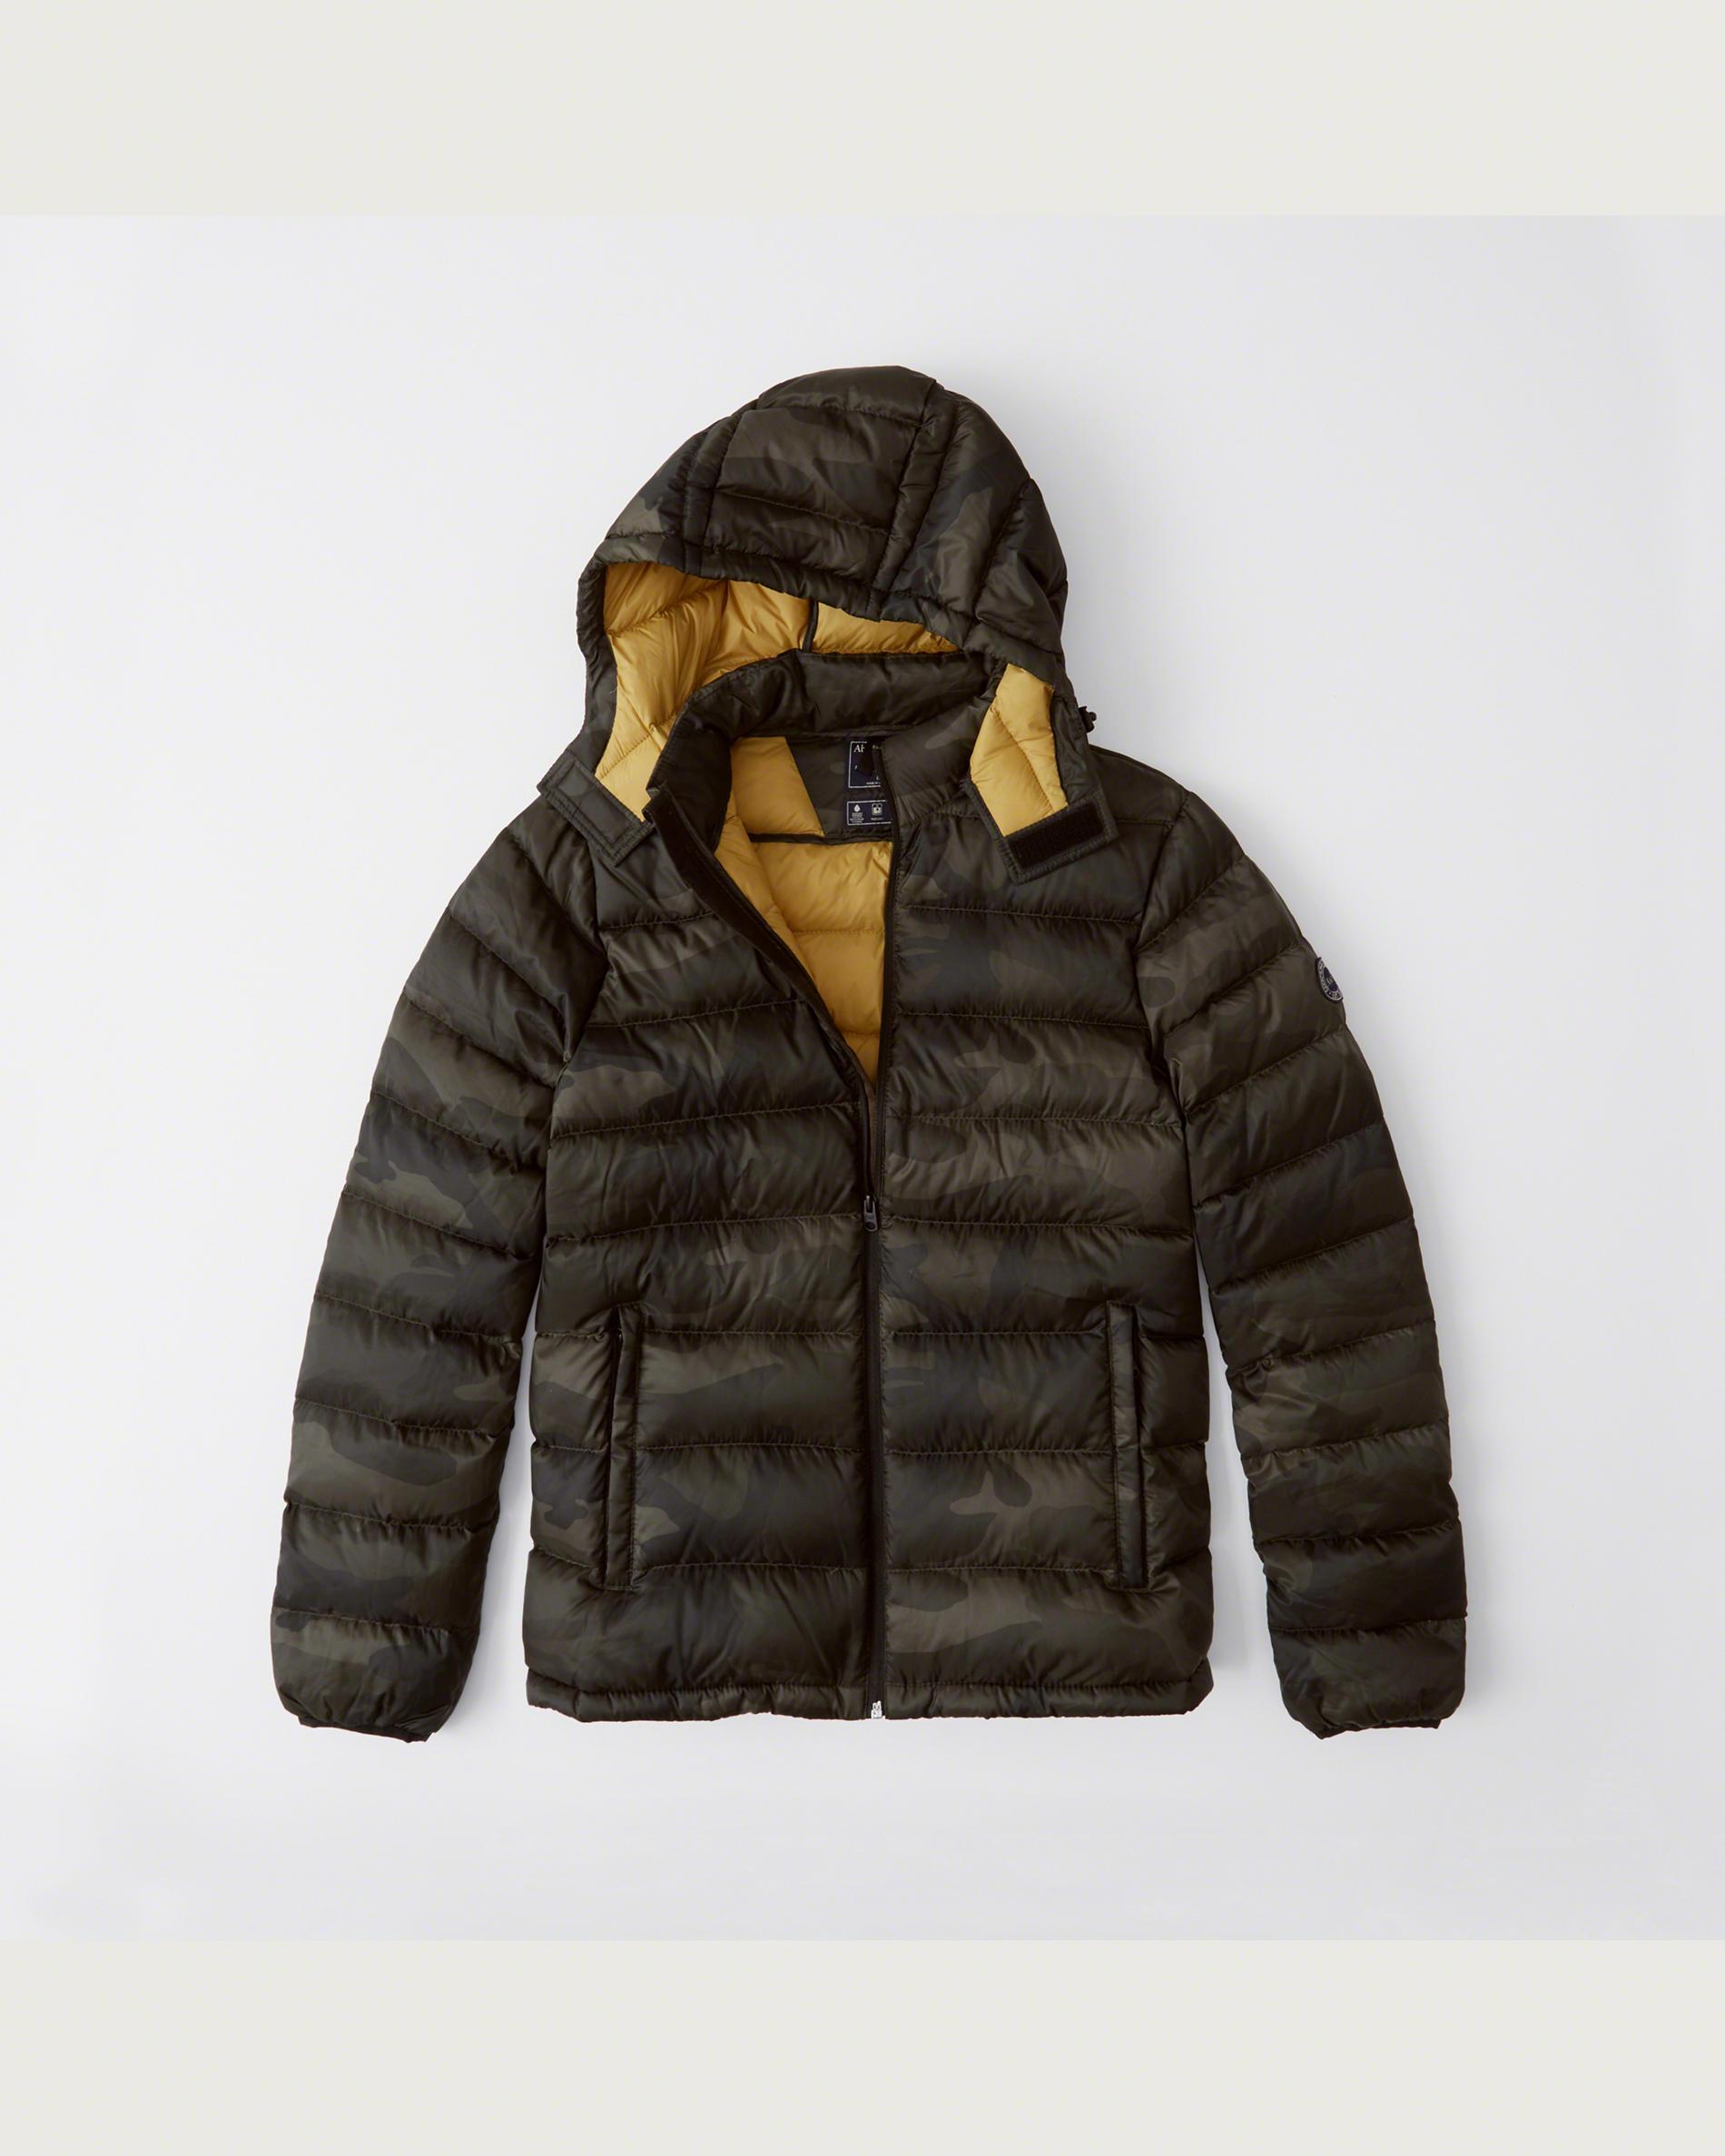 A&F:男裝冬季外套只賣$52.80